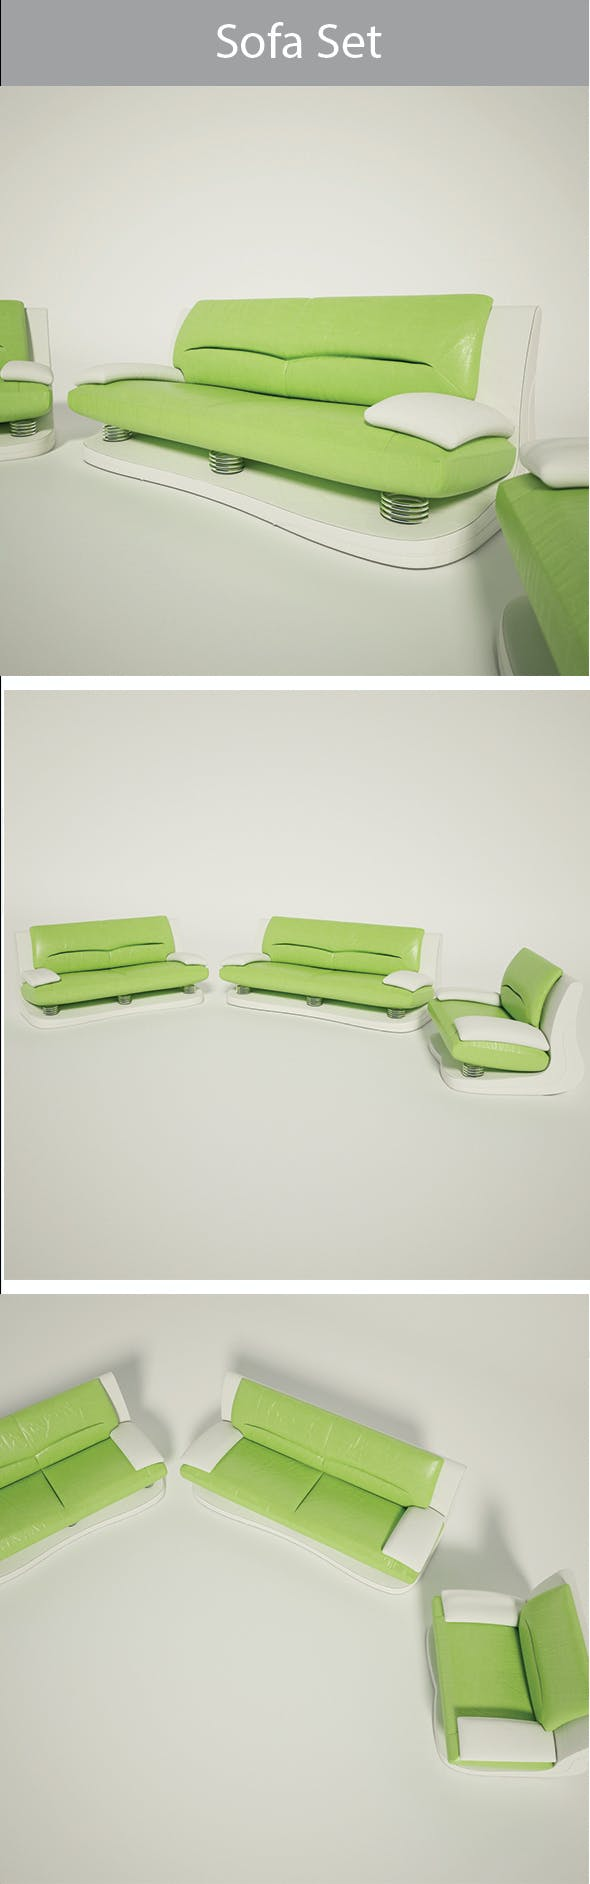 Sofa Set-02 - 3DOcean Item for Sale